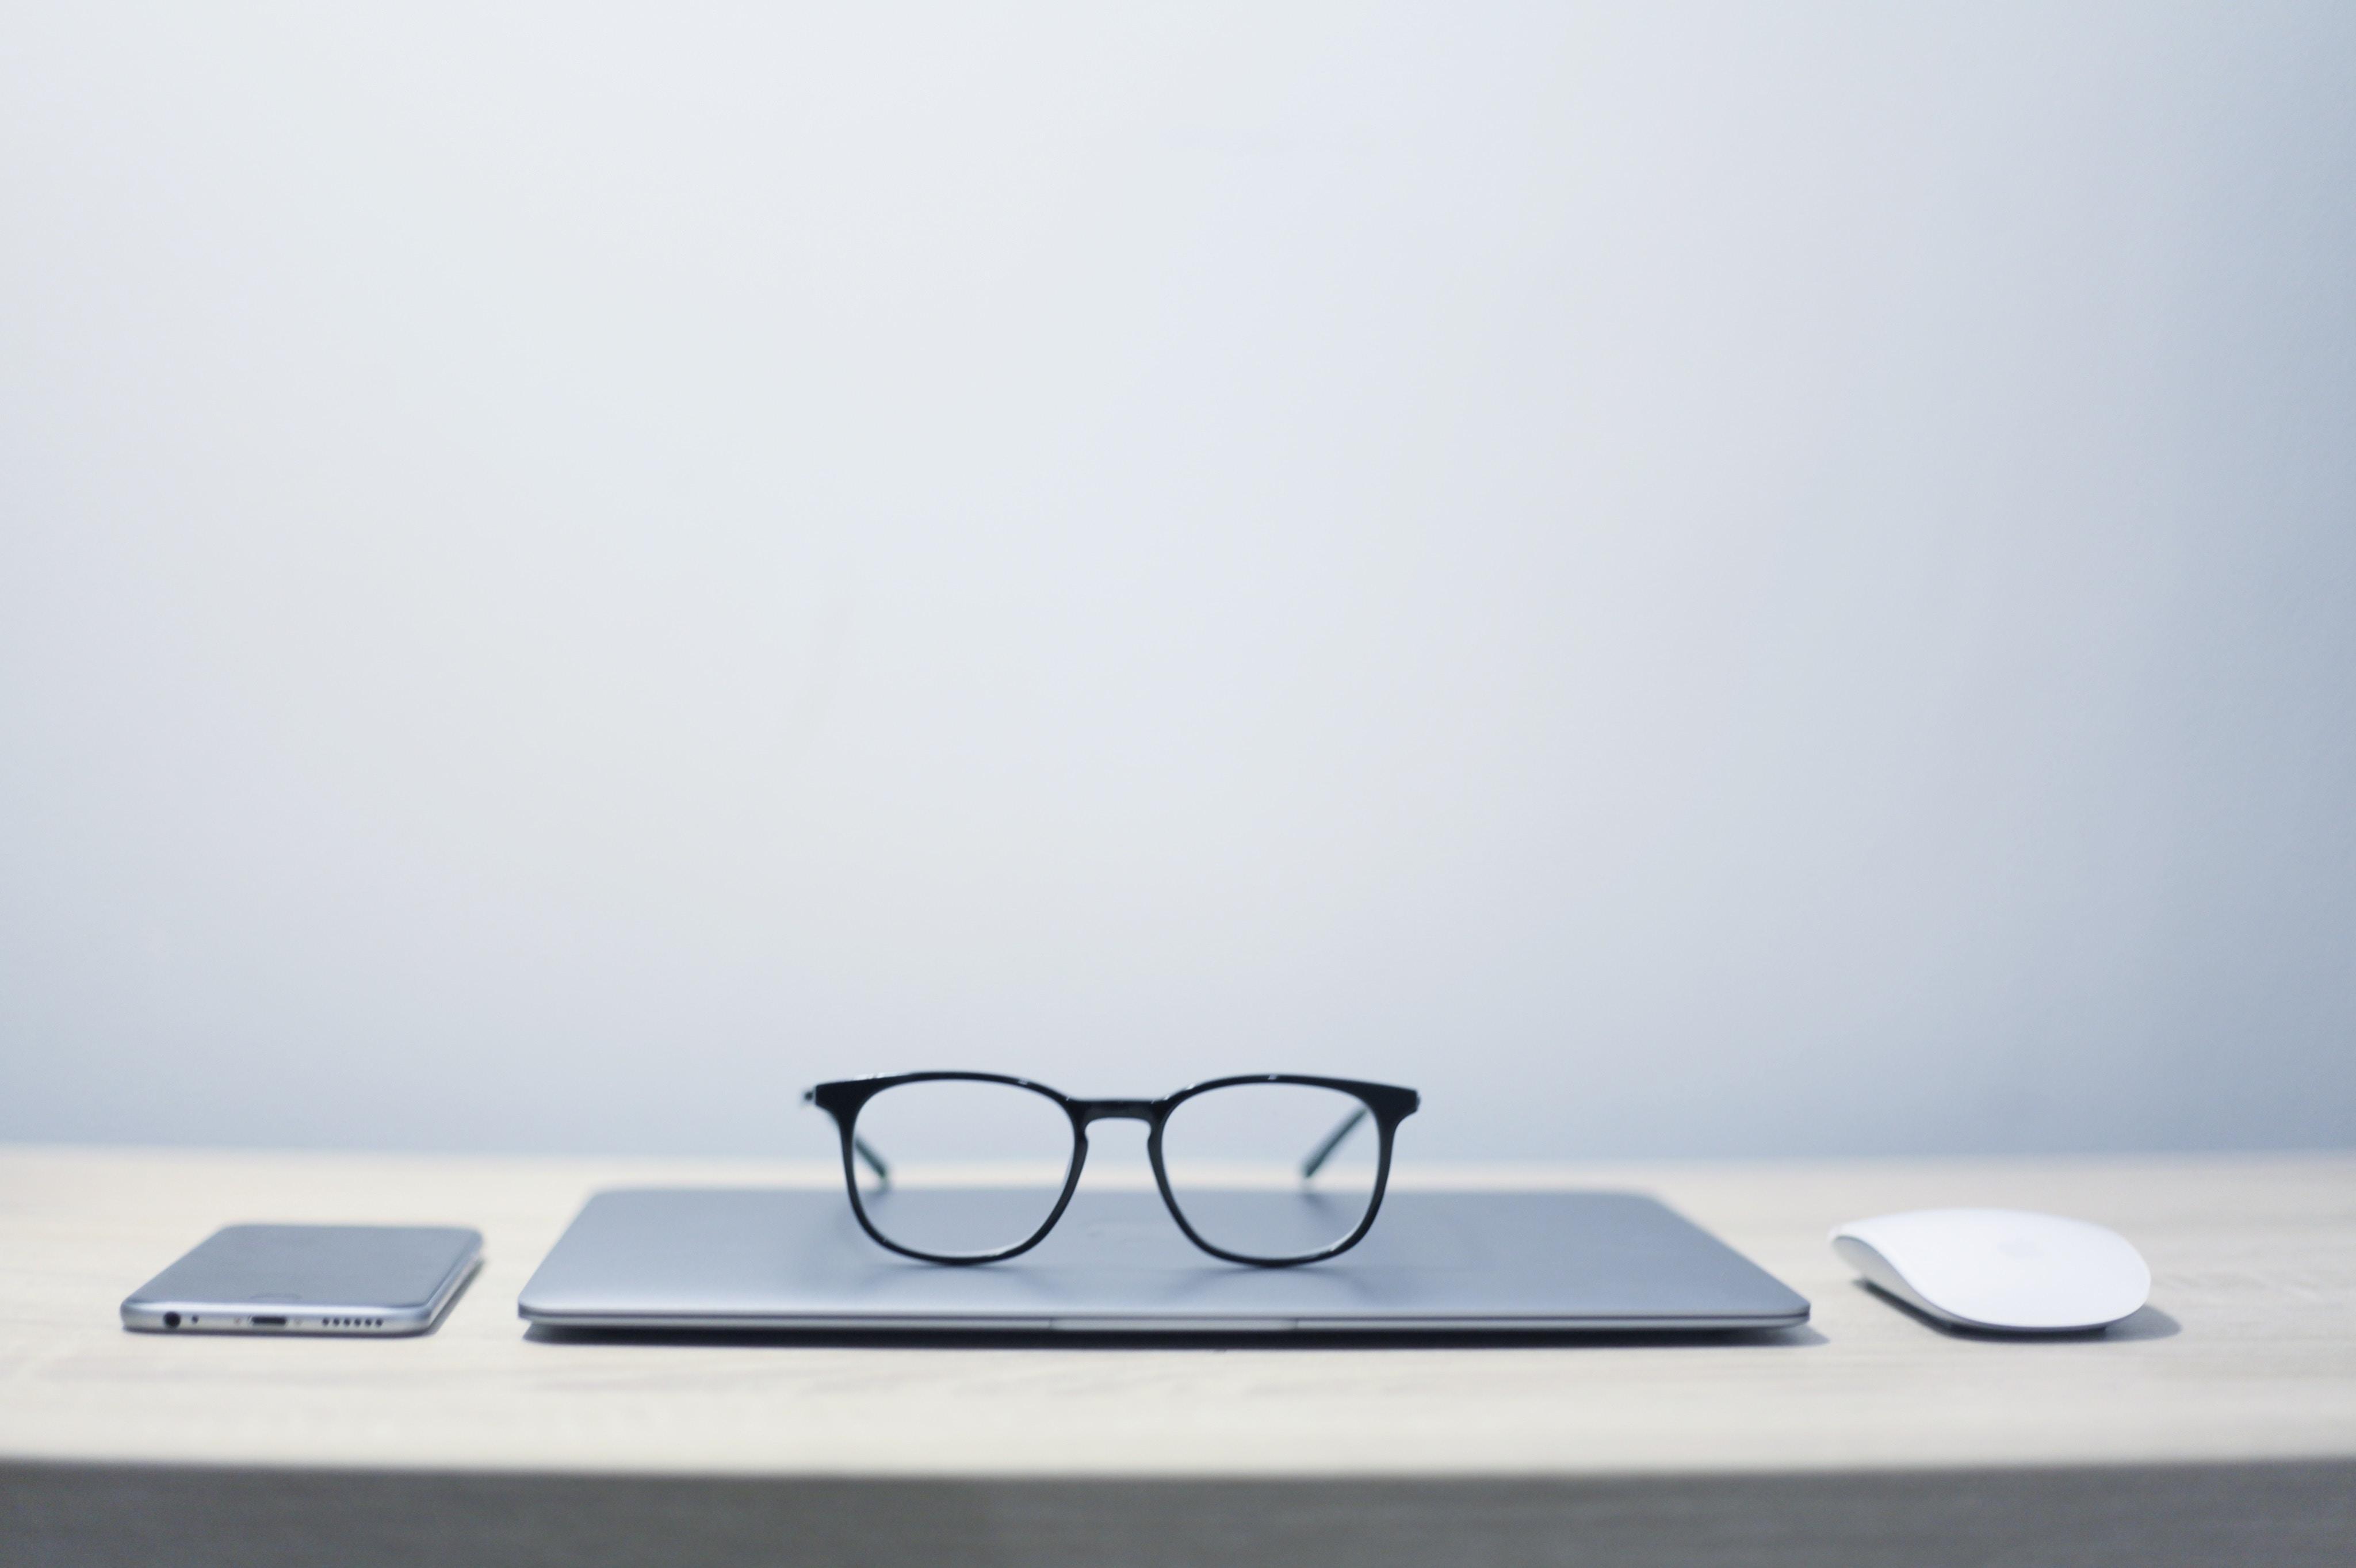 uploads///smart glasses